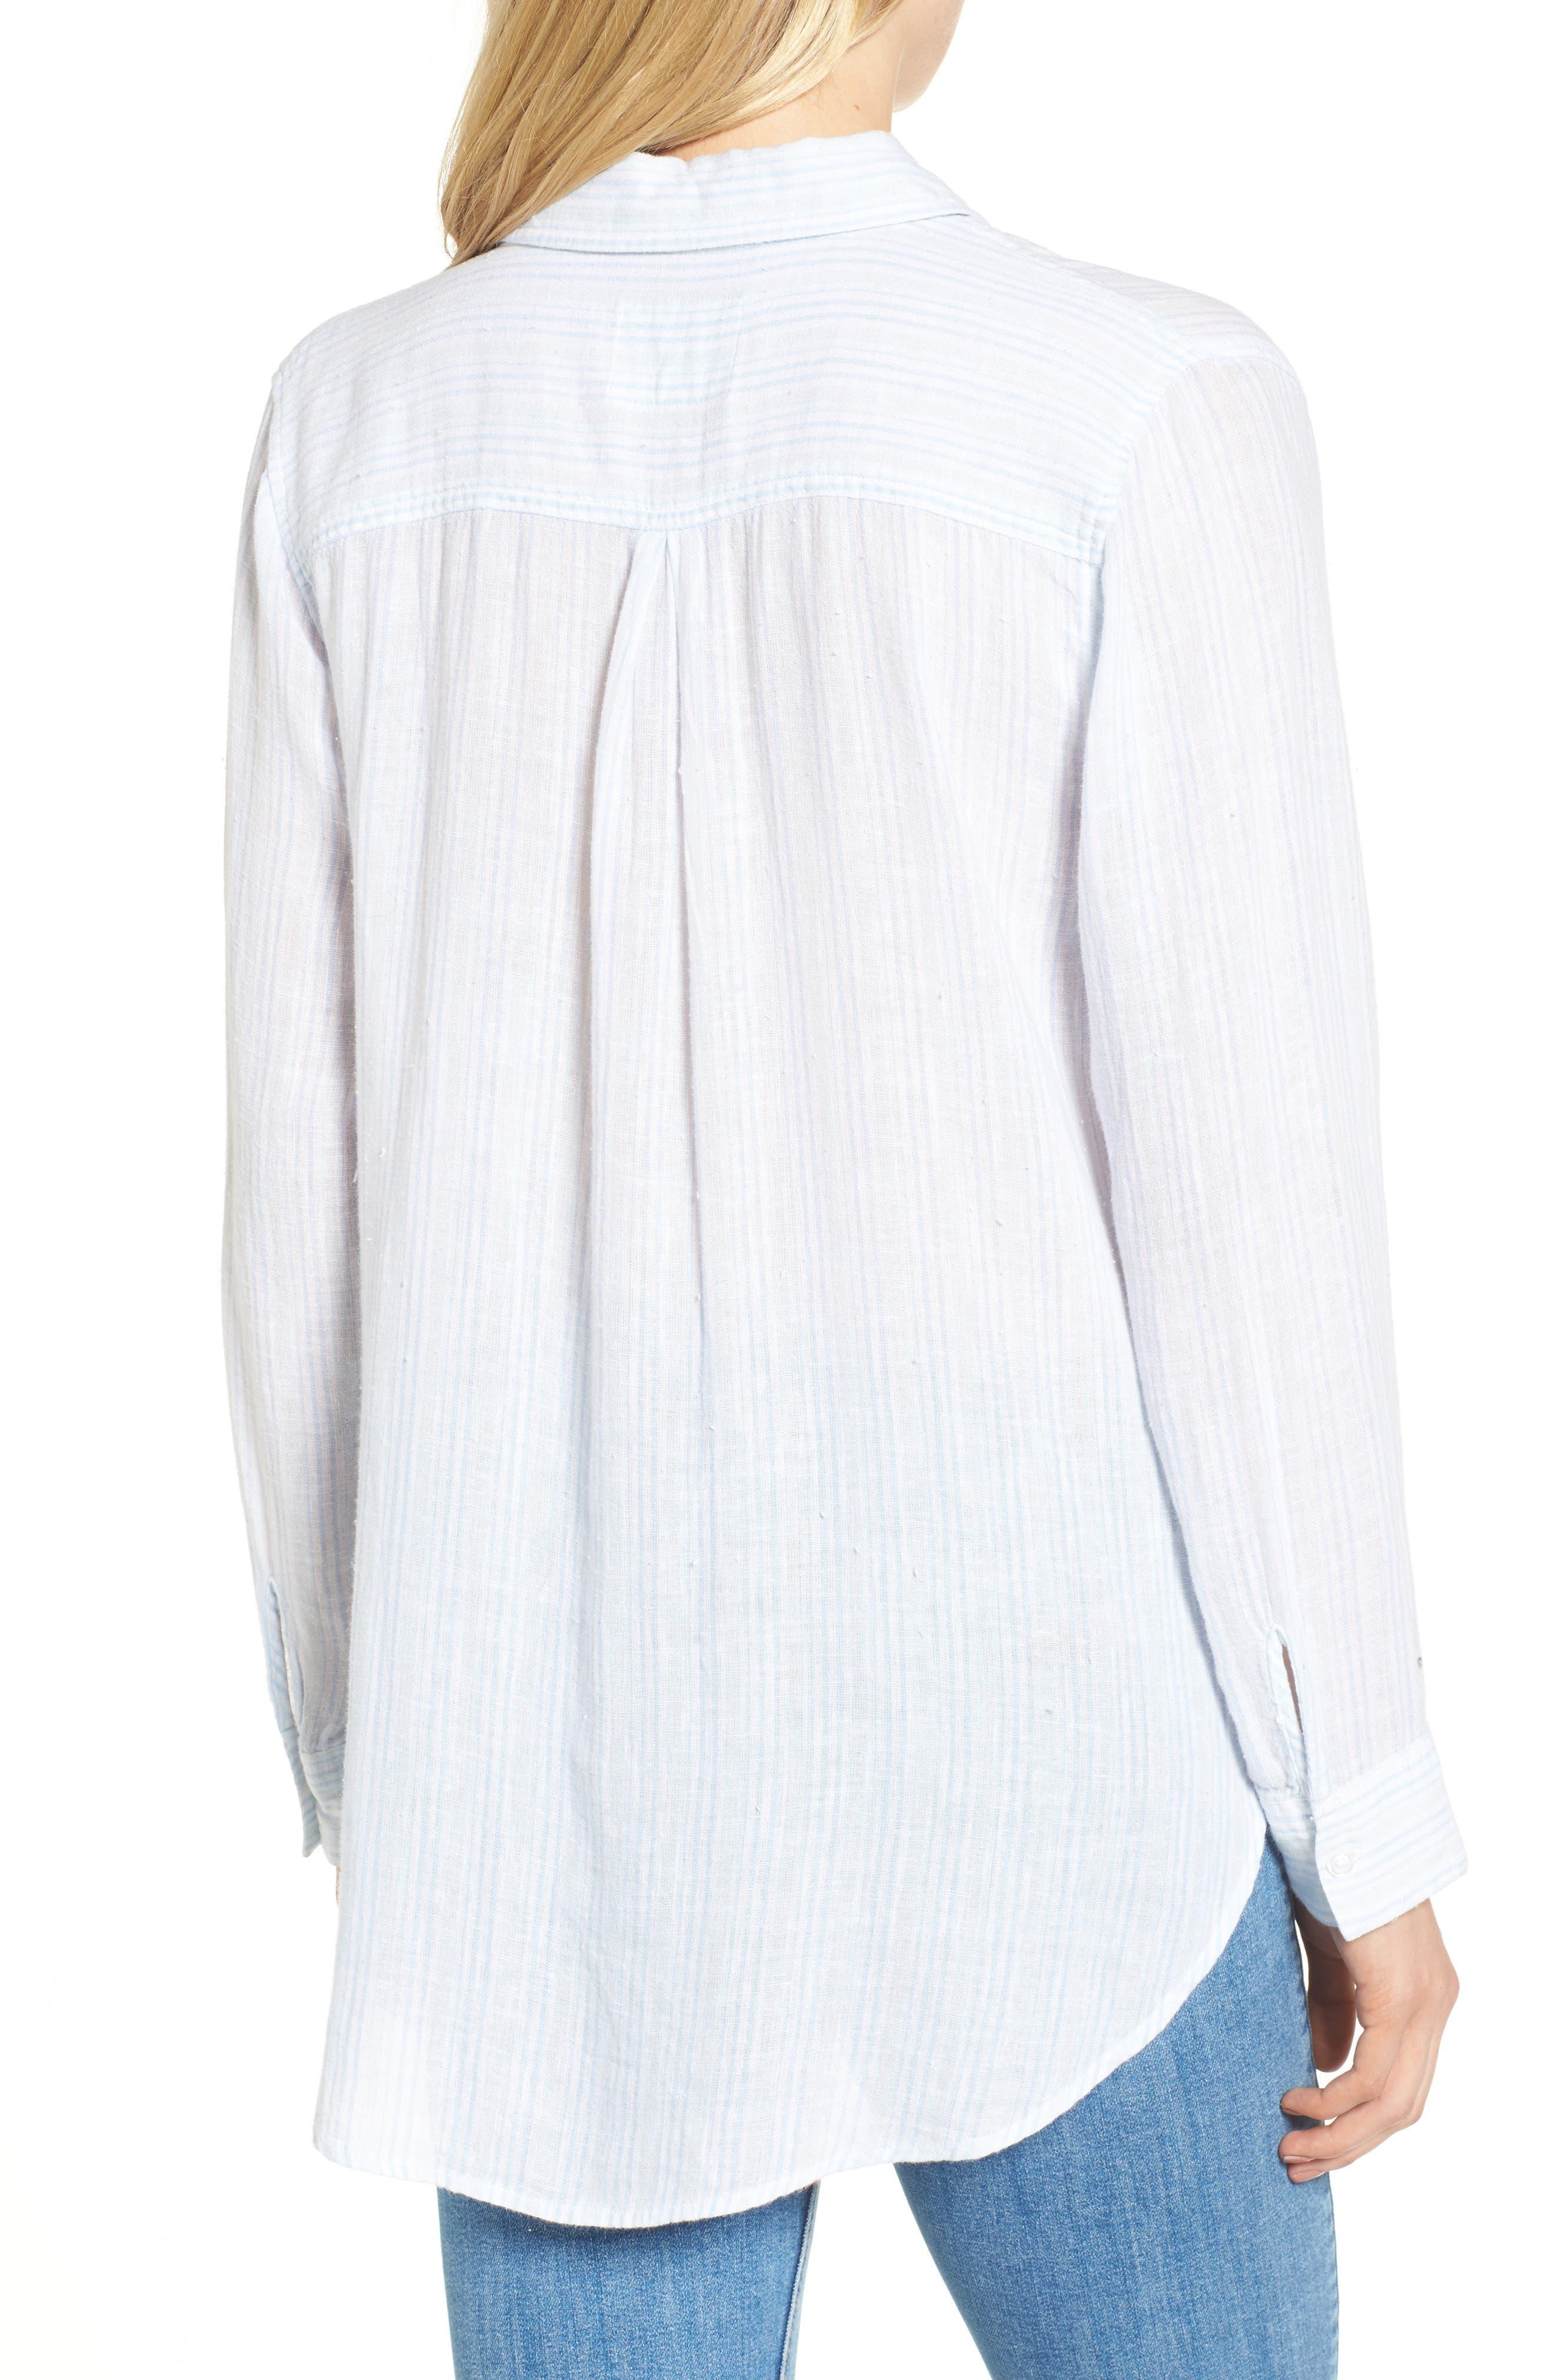 Charli Stripe Shirt,                             Alternate thumbnail 2, color,